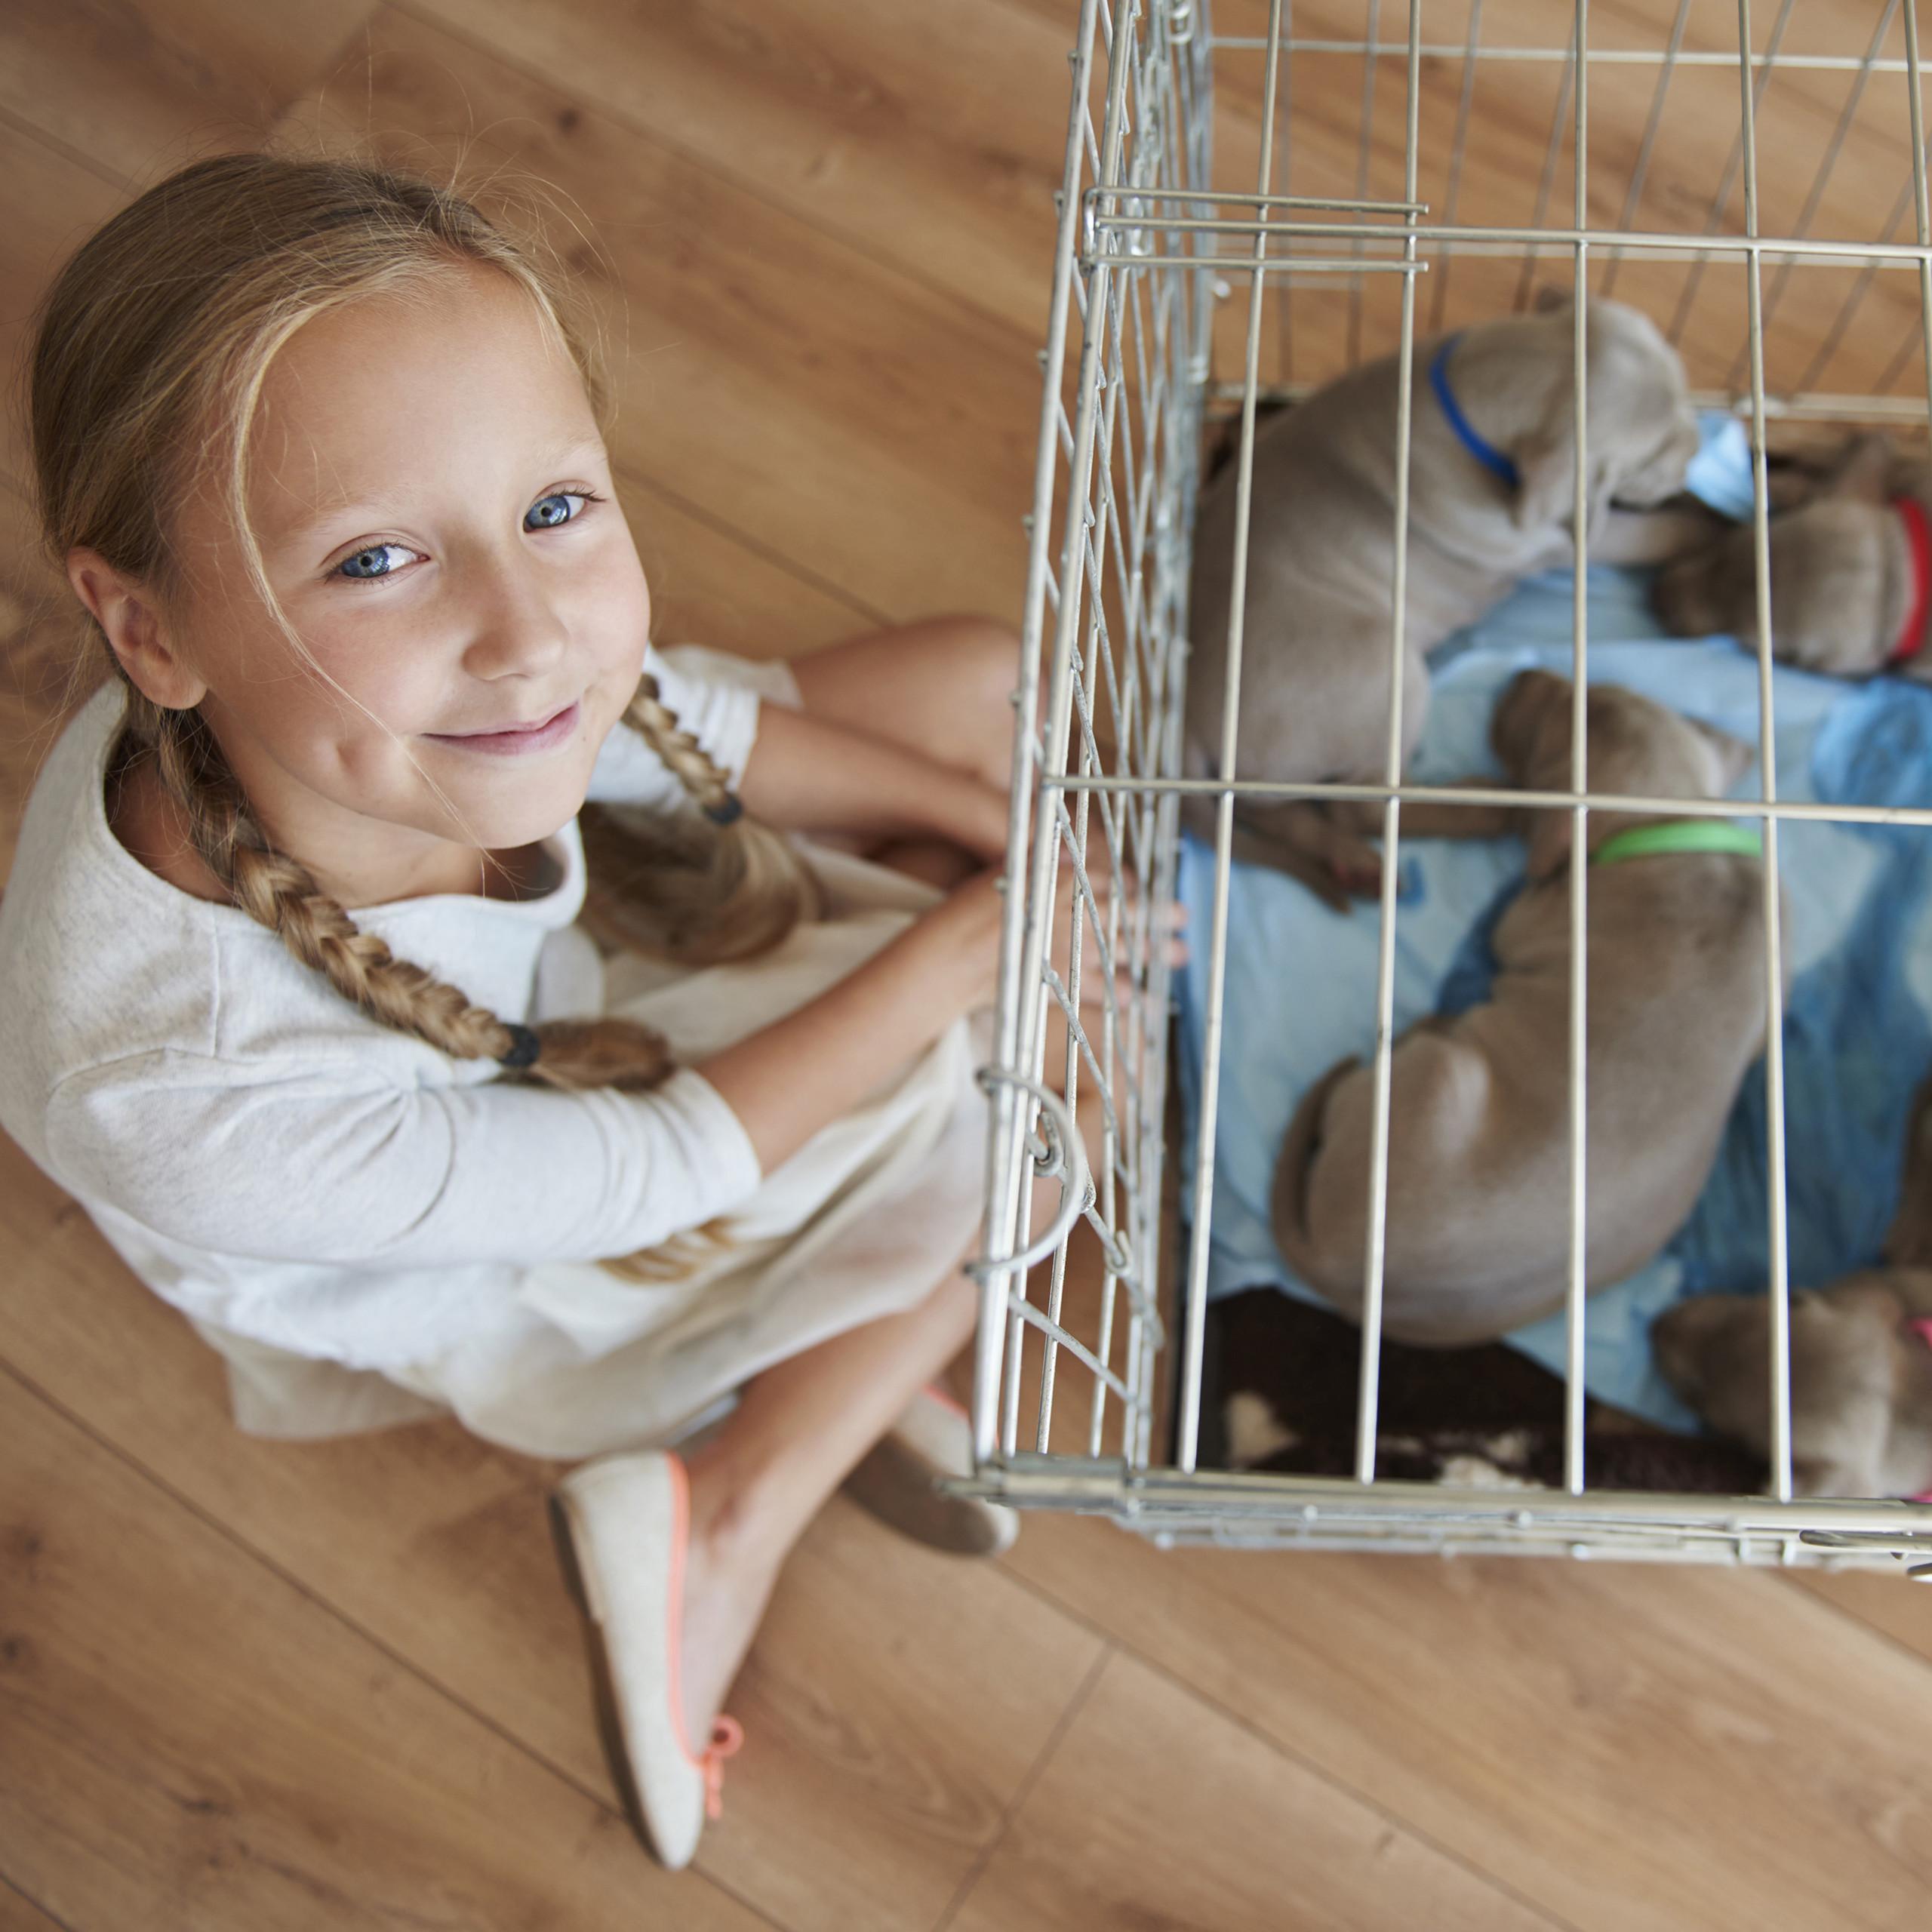 Hondenbench-dubbel-transportbench-transportbox-draadkooi-hond-L-XL-opvouwbaar miniatuur 14